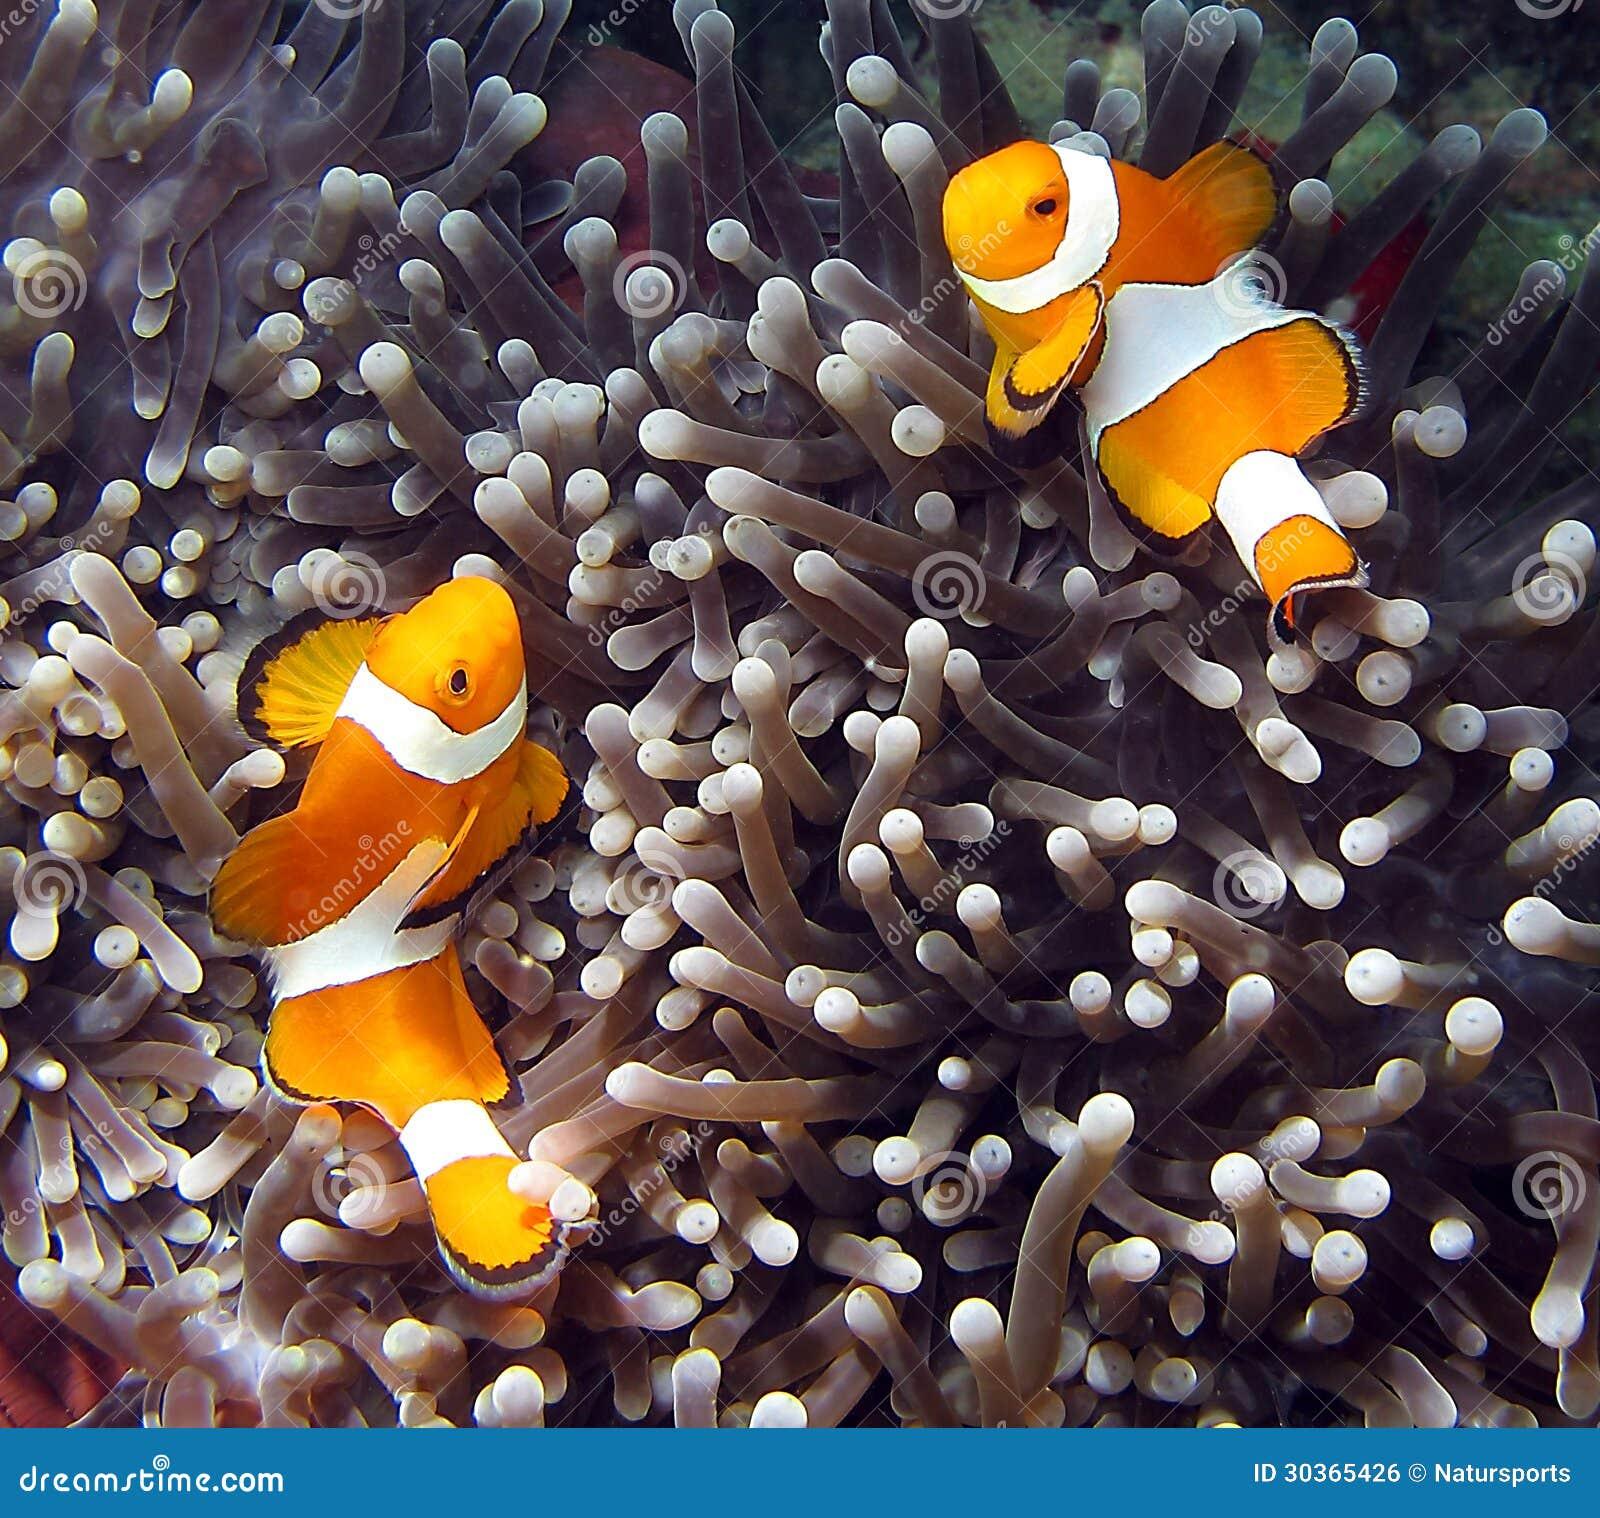 Lankayan Island: Clownfish Stock Photo. Image Of Animal, Coral, Fishes